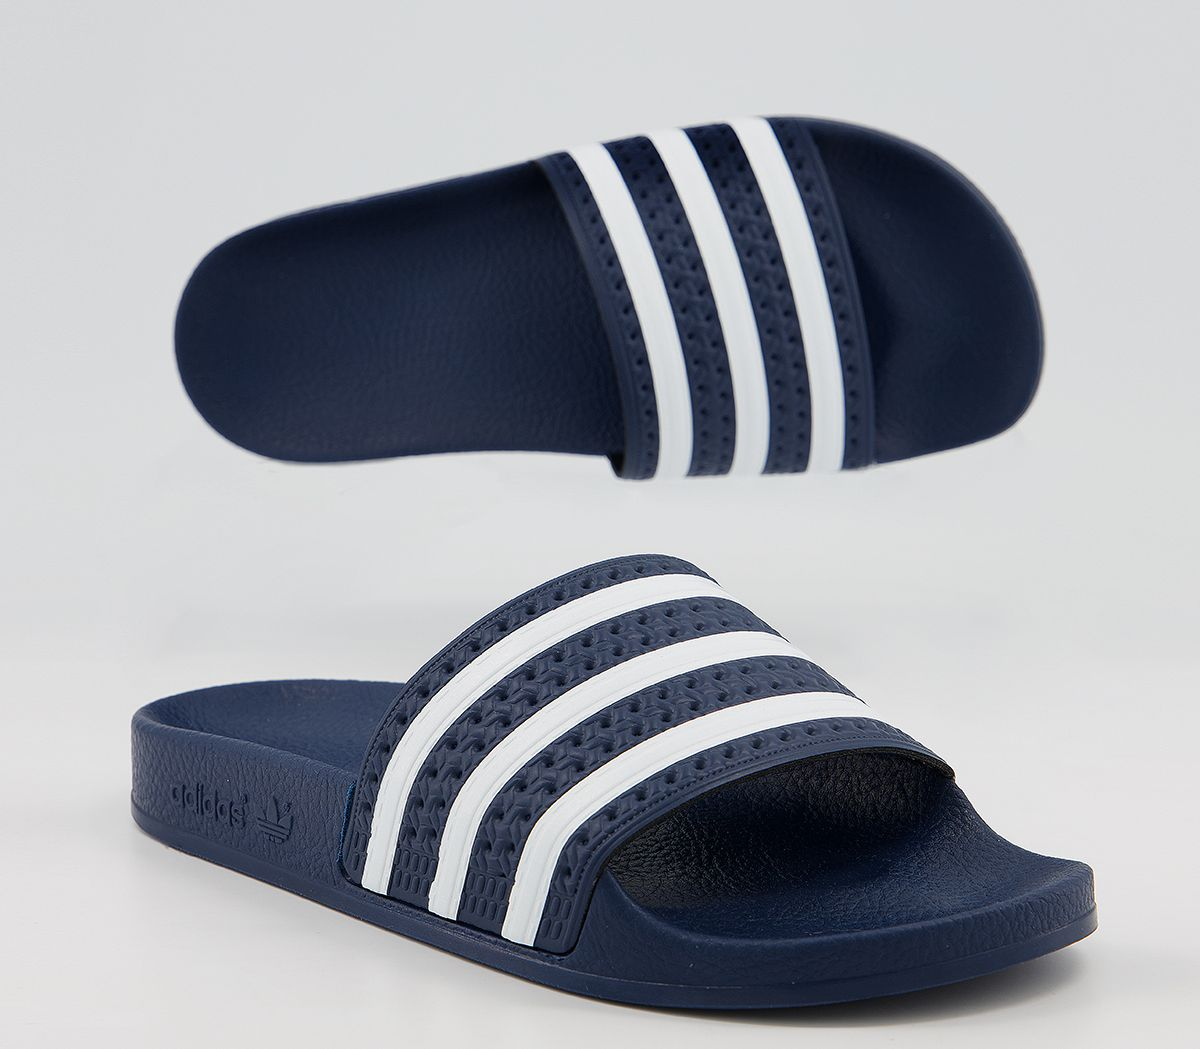 best sneakers 3ea0d 00493 Sentinel Womens Adidas Adilette Sliders Navy White Sandals